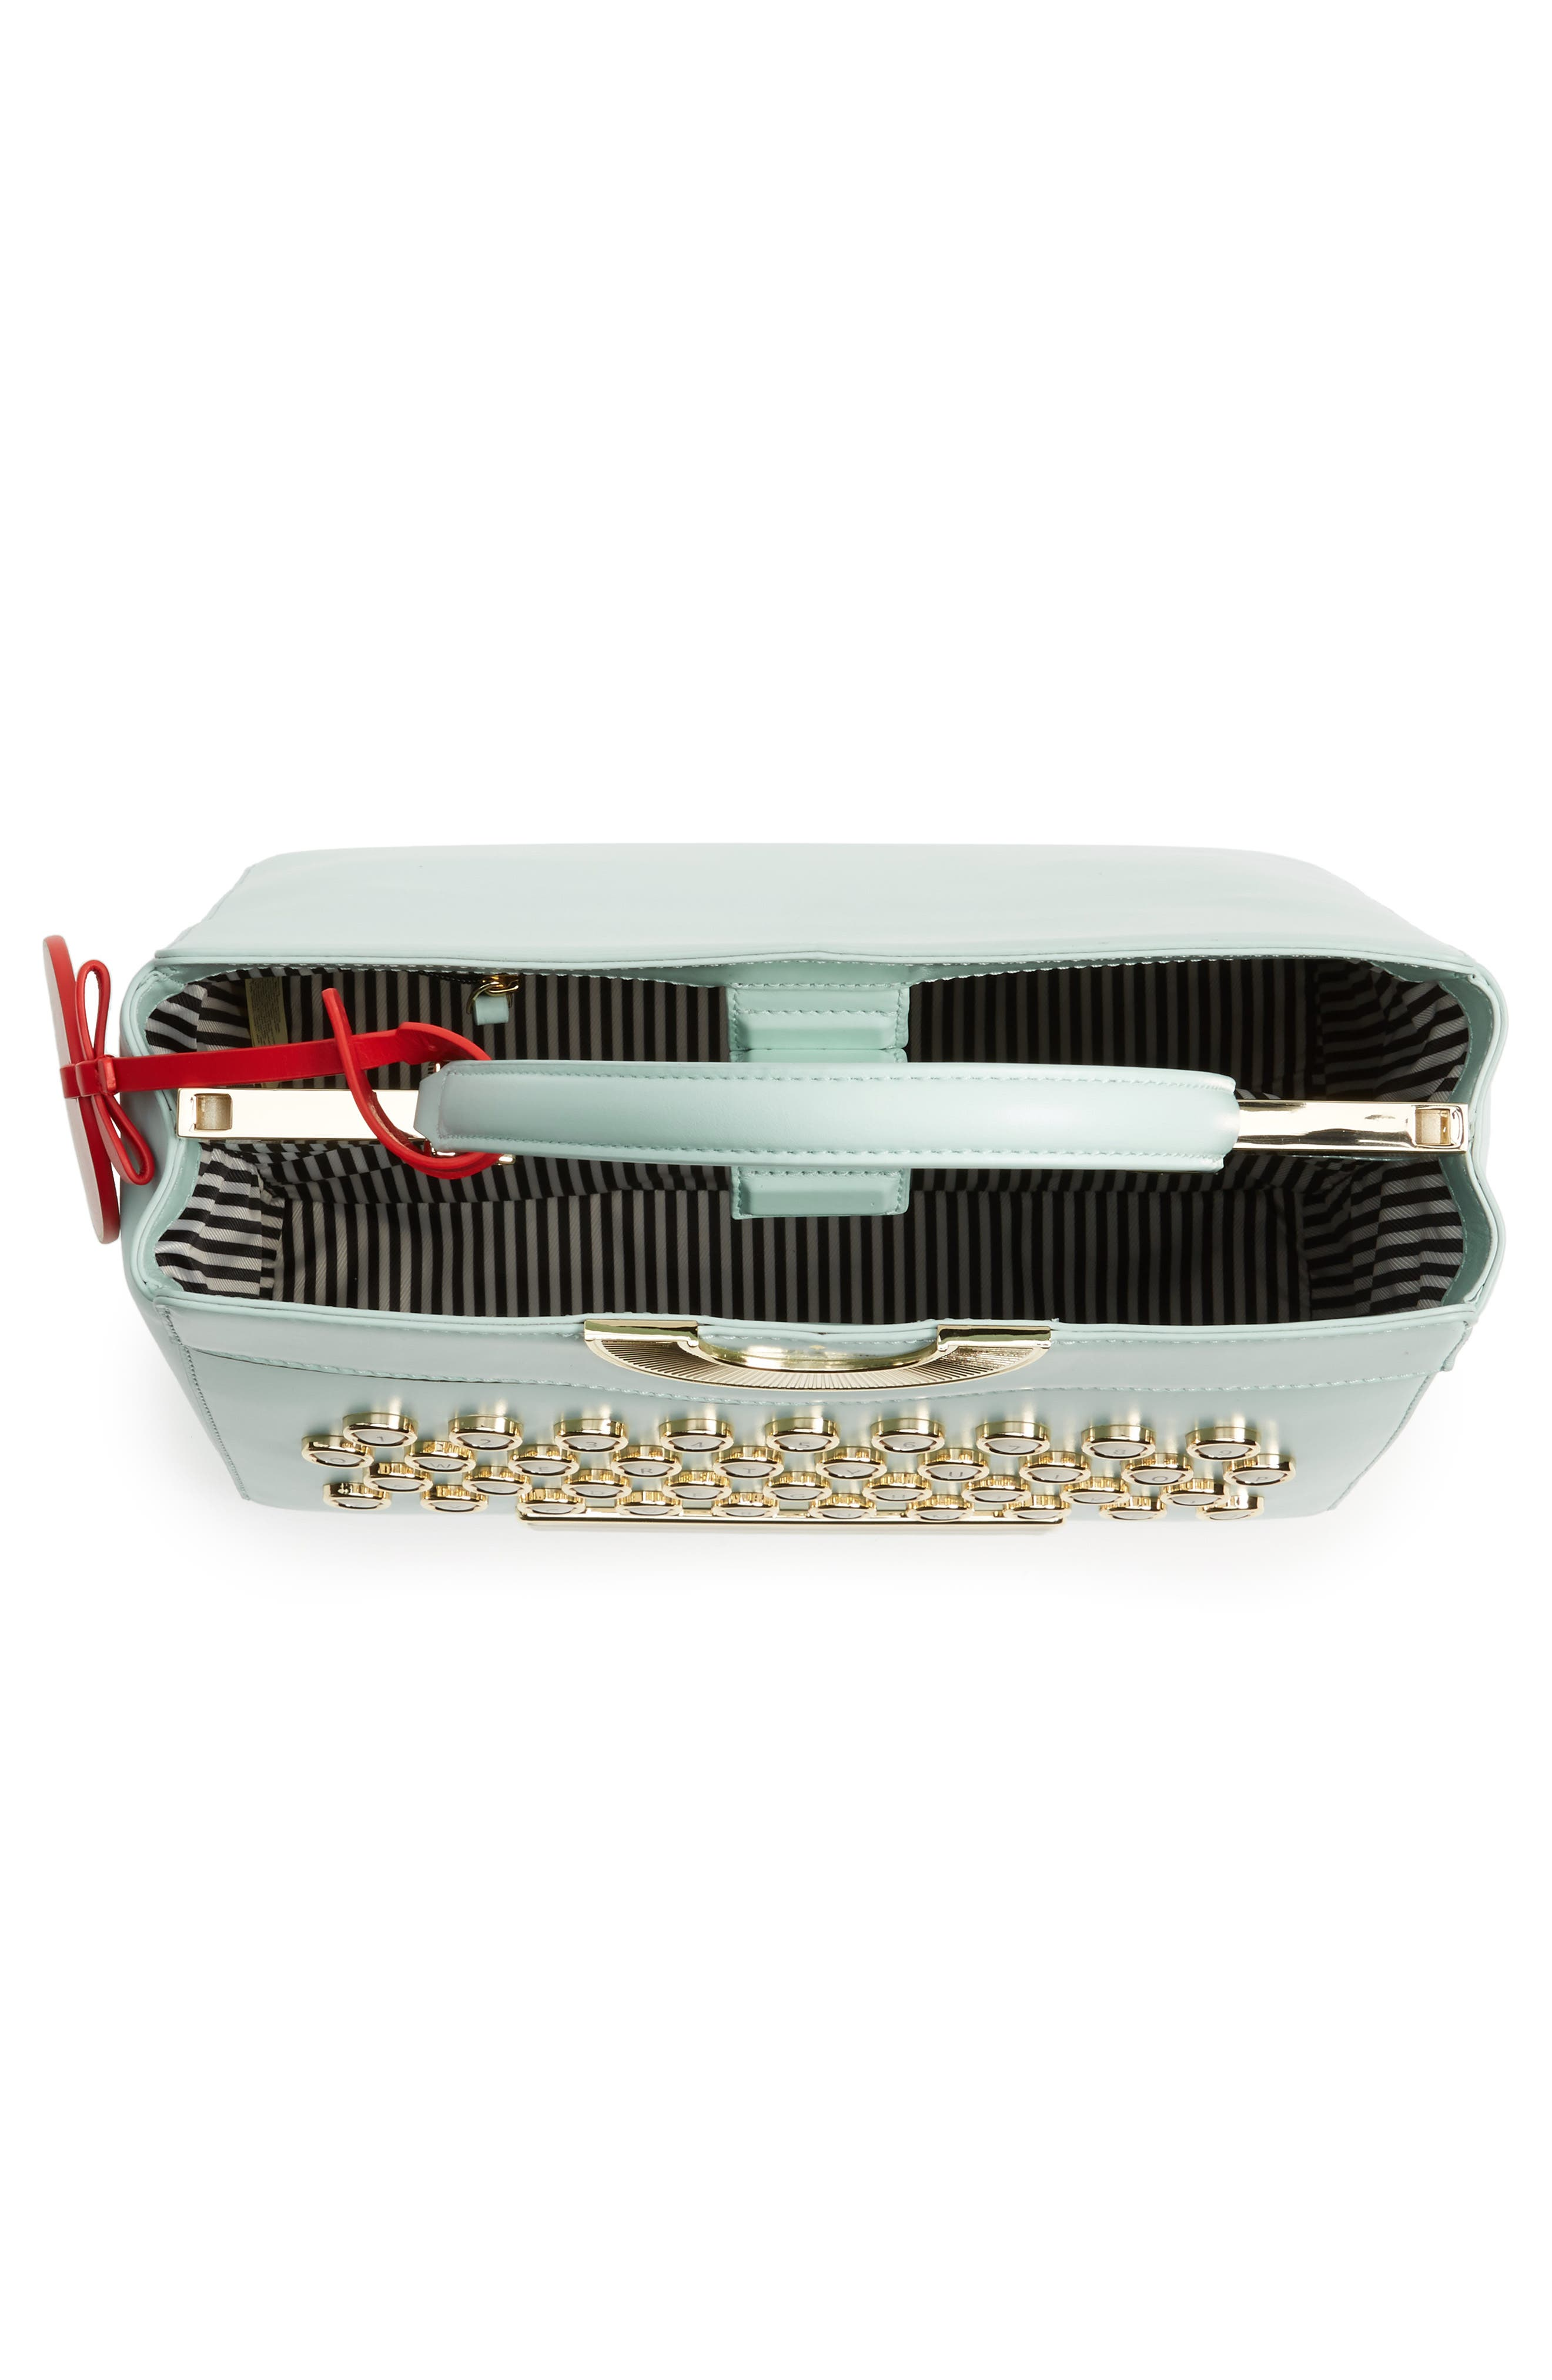 be mine - typewriter leather satchel,                             Alternate thumbnail 5, color,                             474